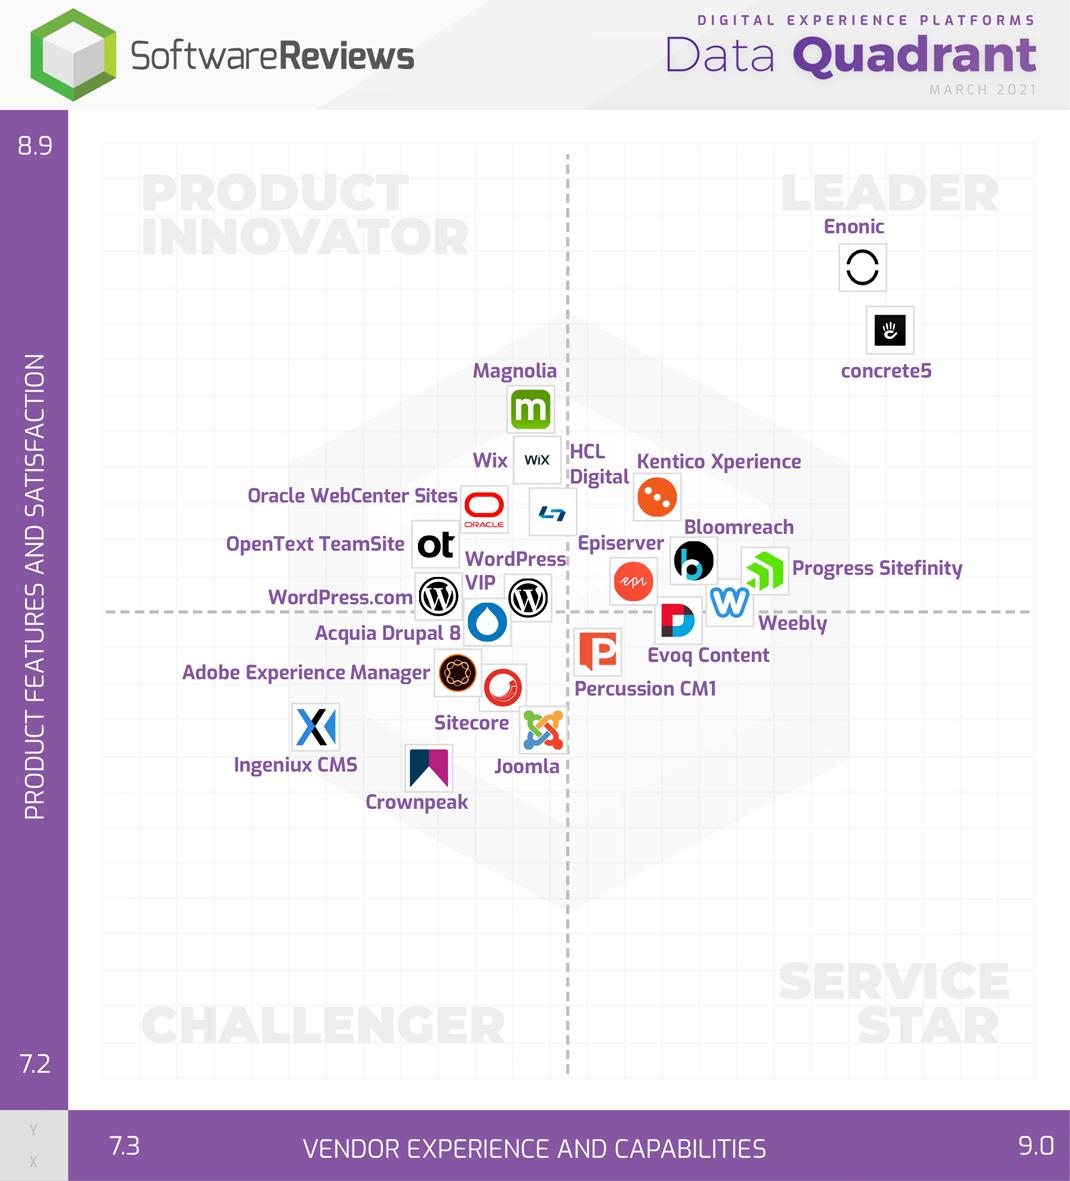 Digital Experience Platforms Data Quadrant